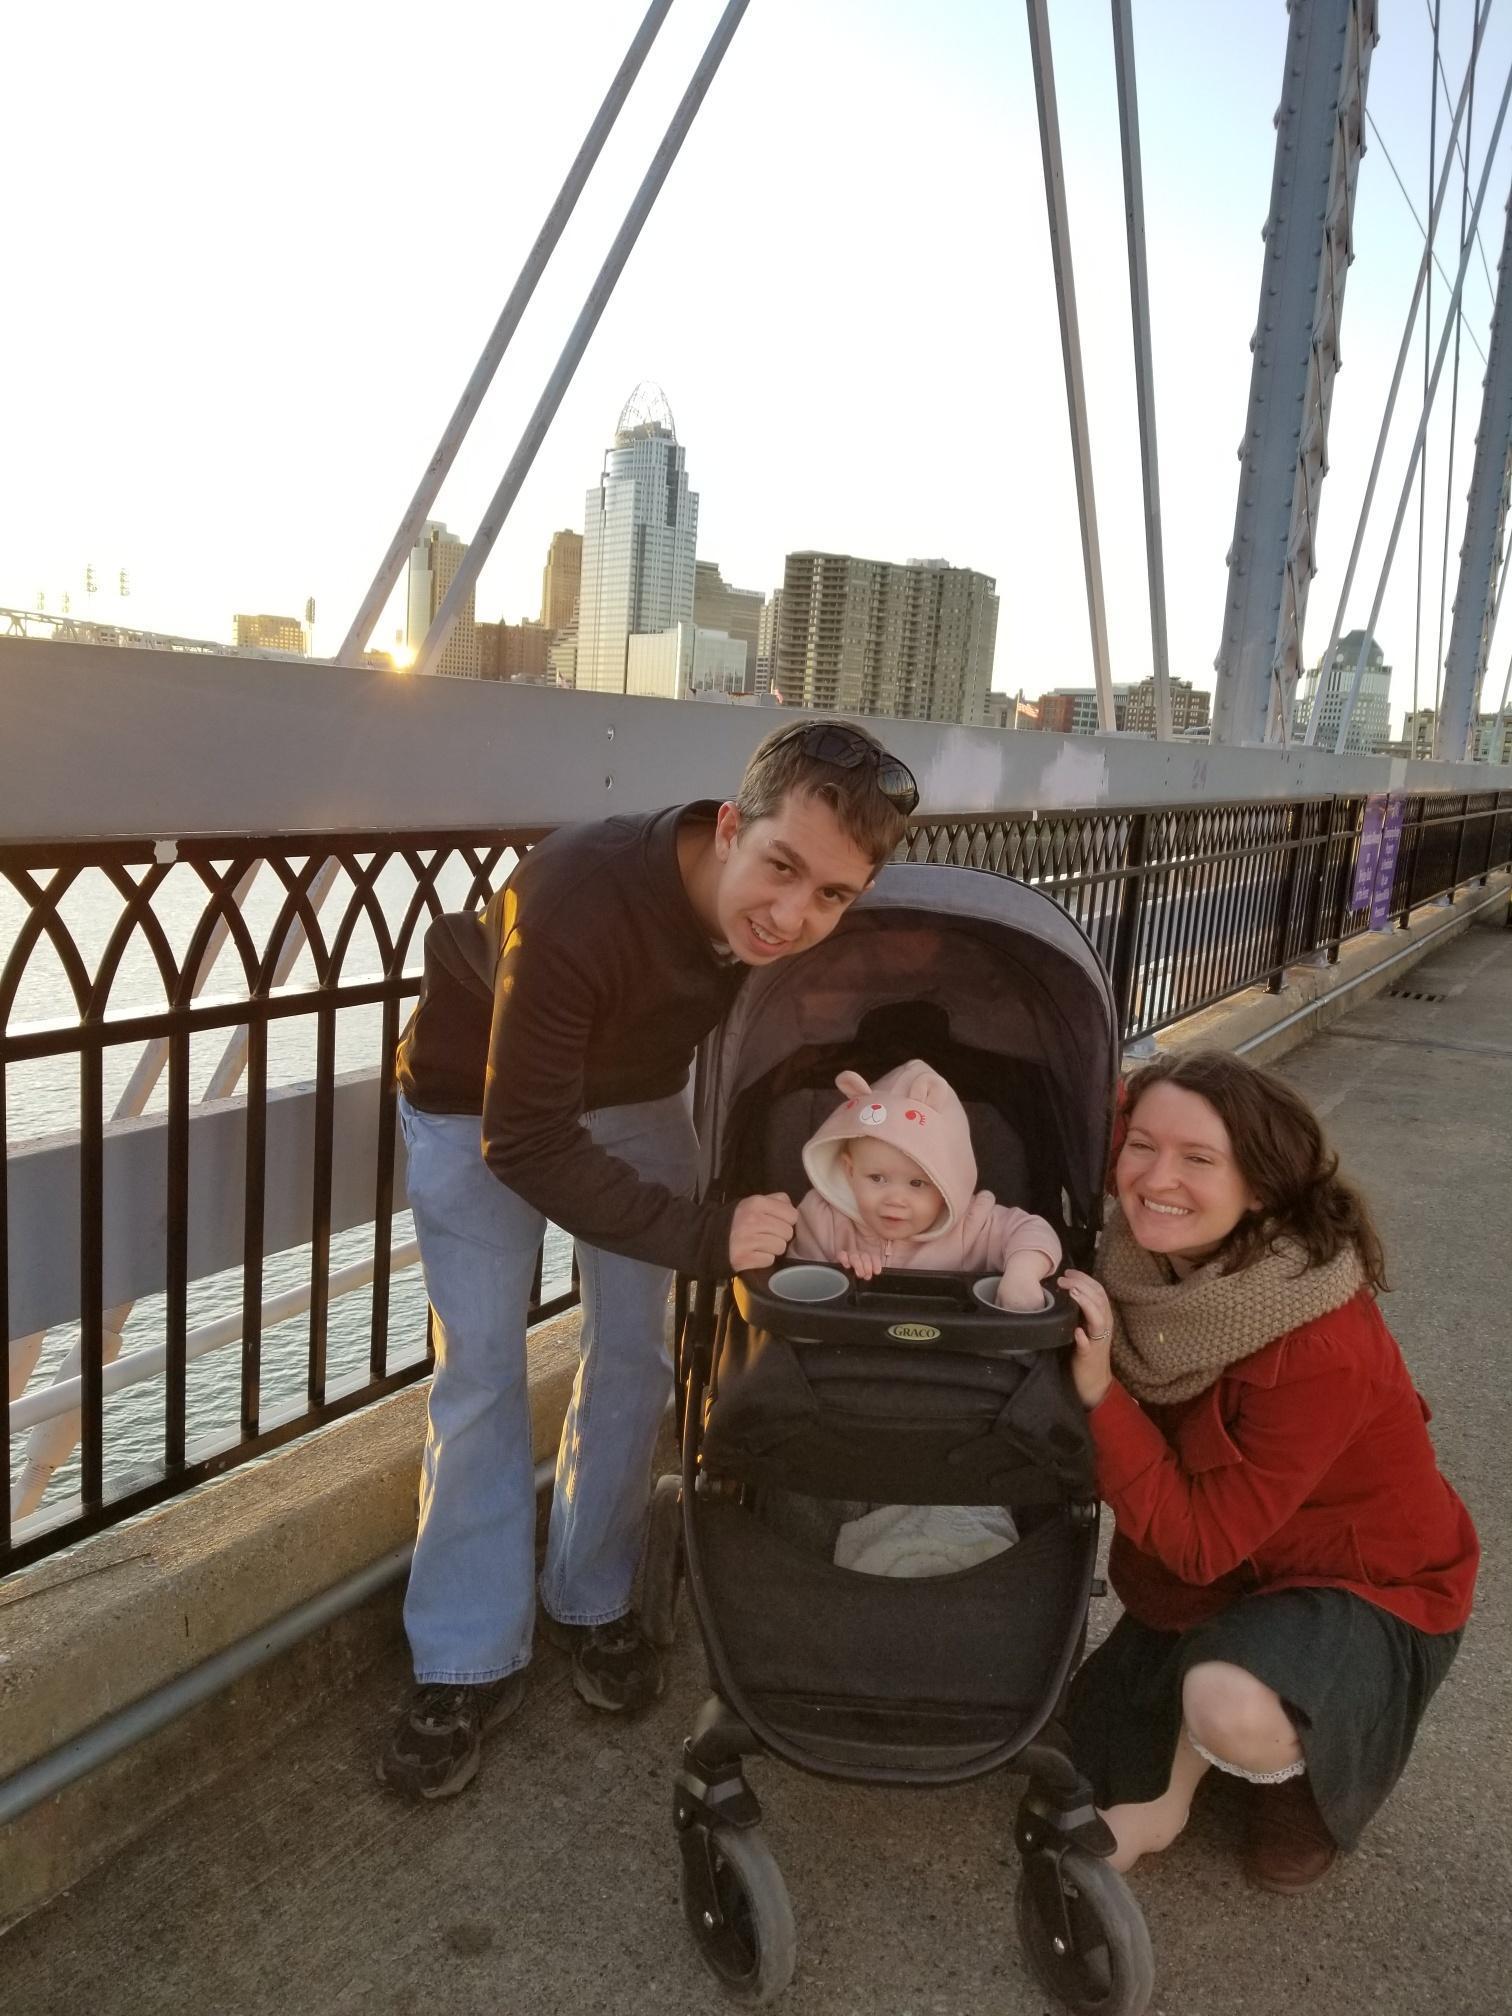 Family on the Purple People Bridge between Newport, KY and Cincinnati, OH